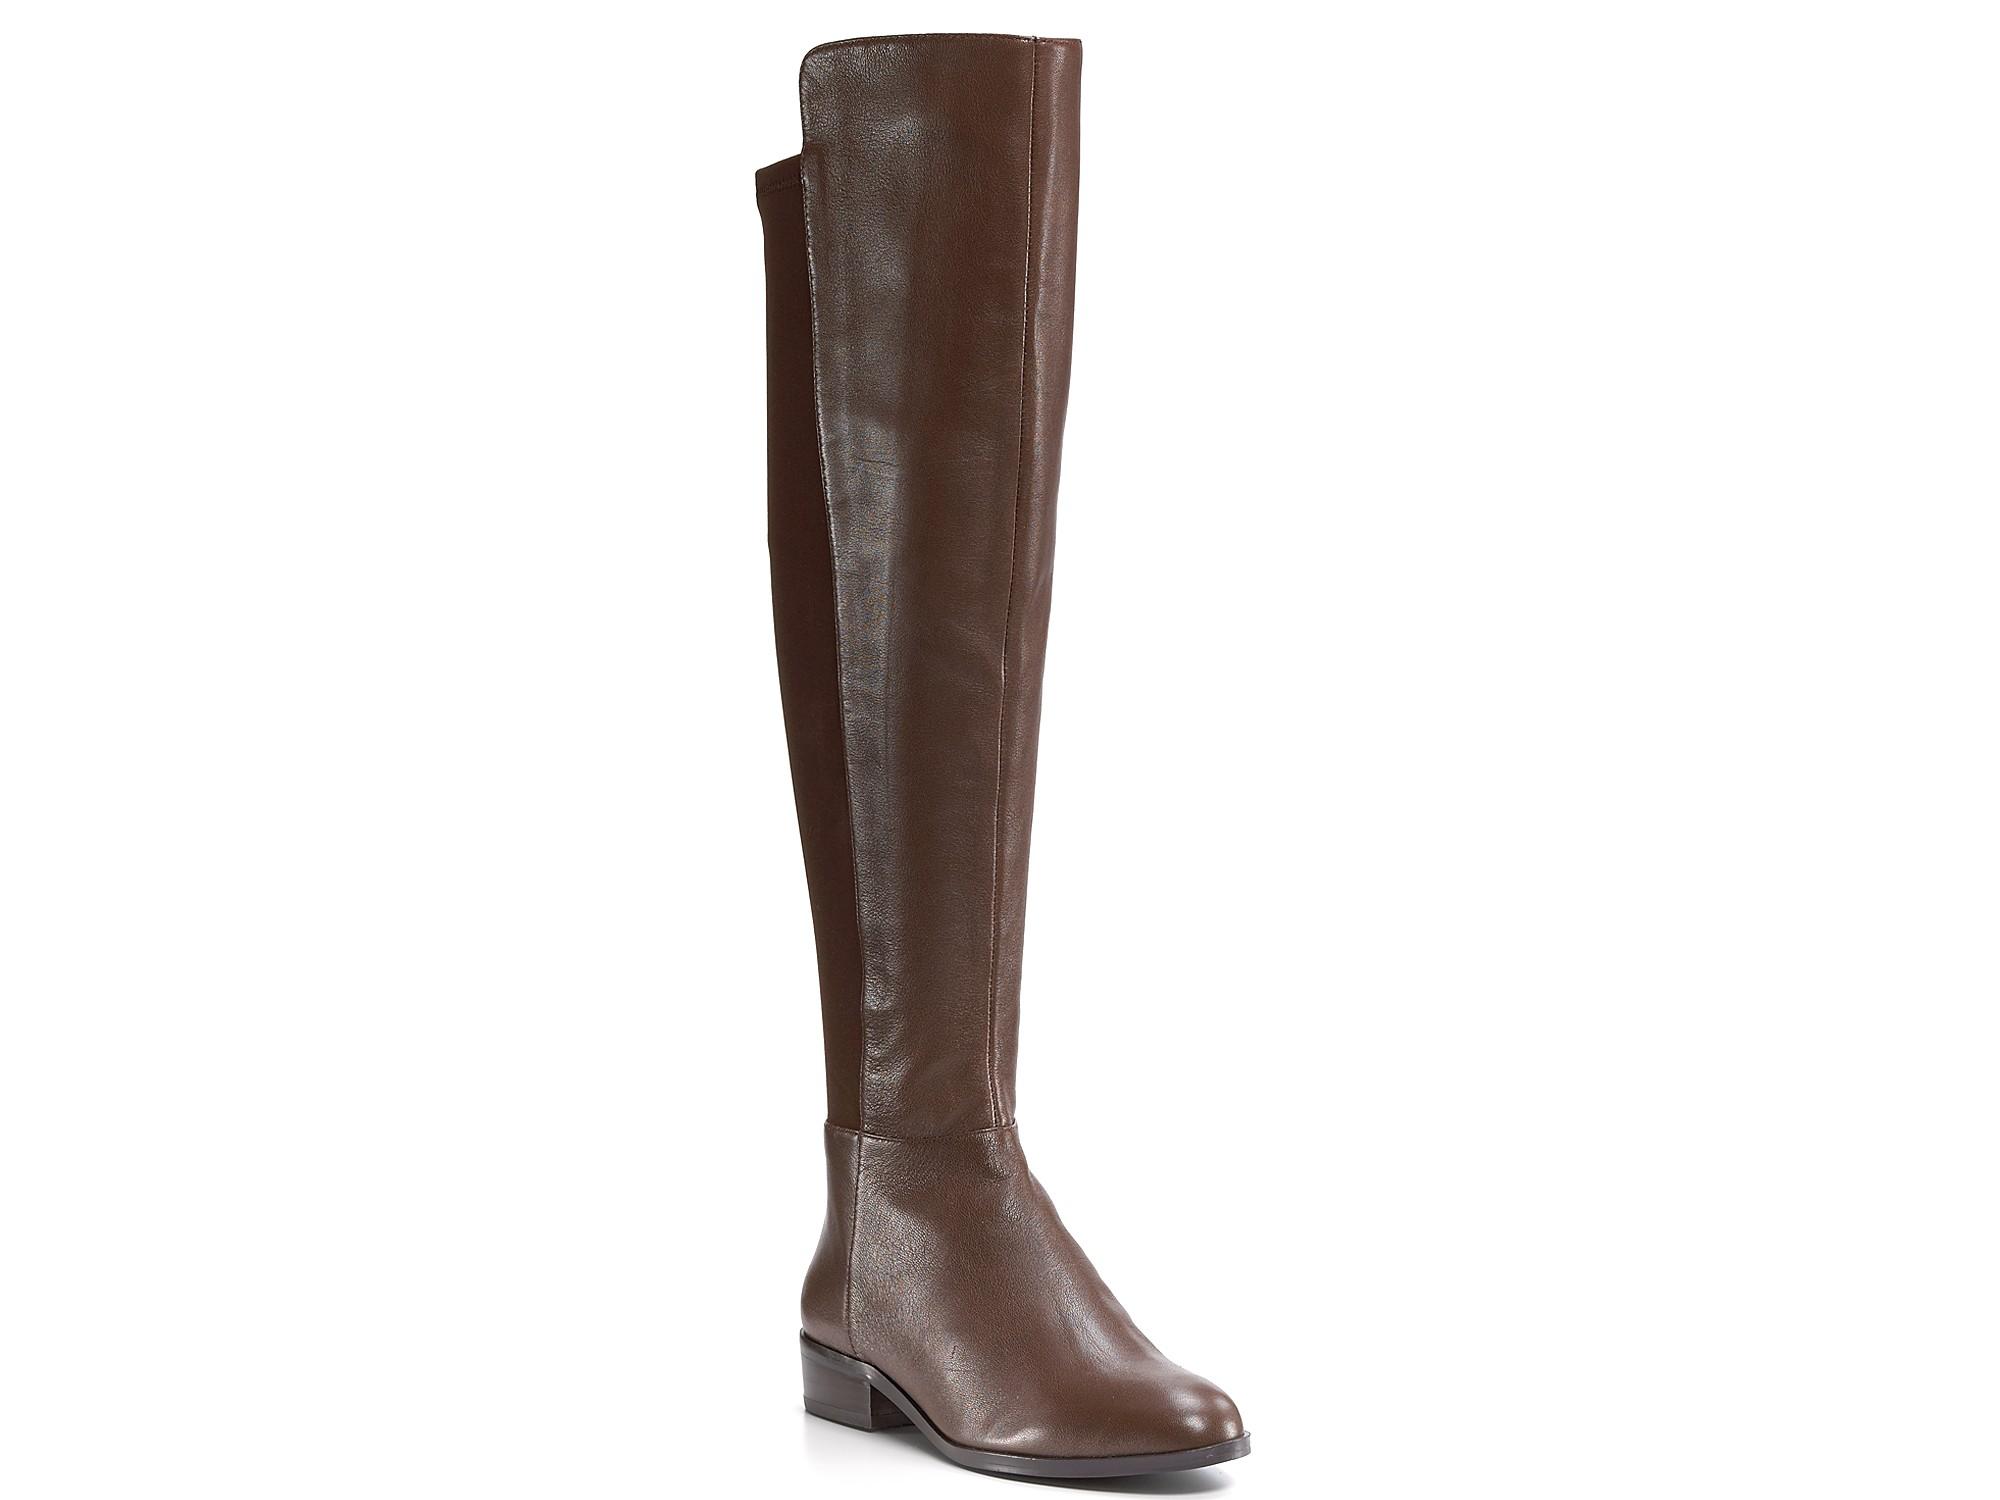 michael kors michael bromley flat boots in brown mocha